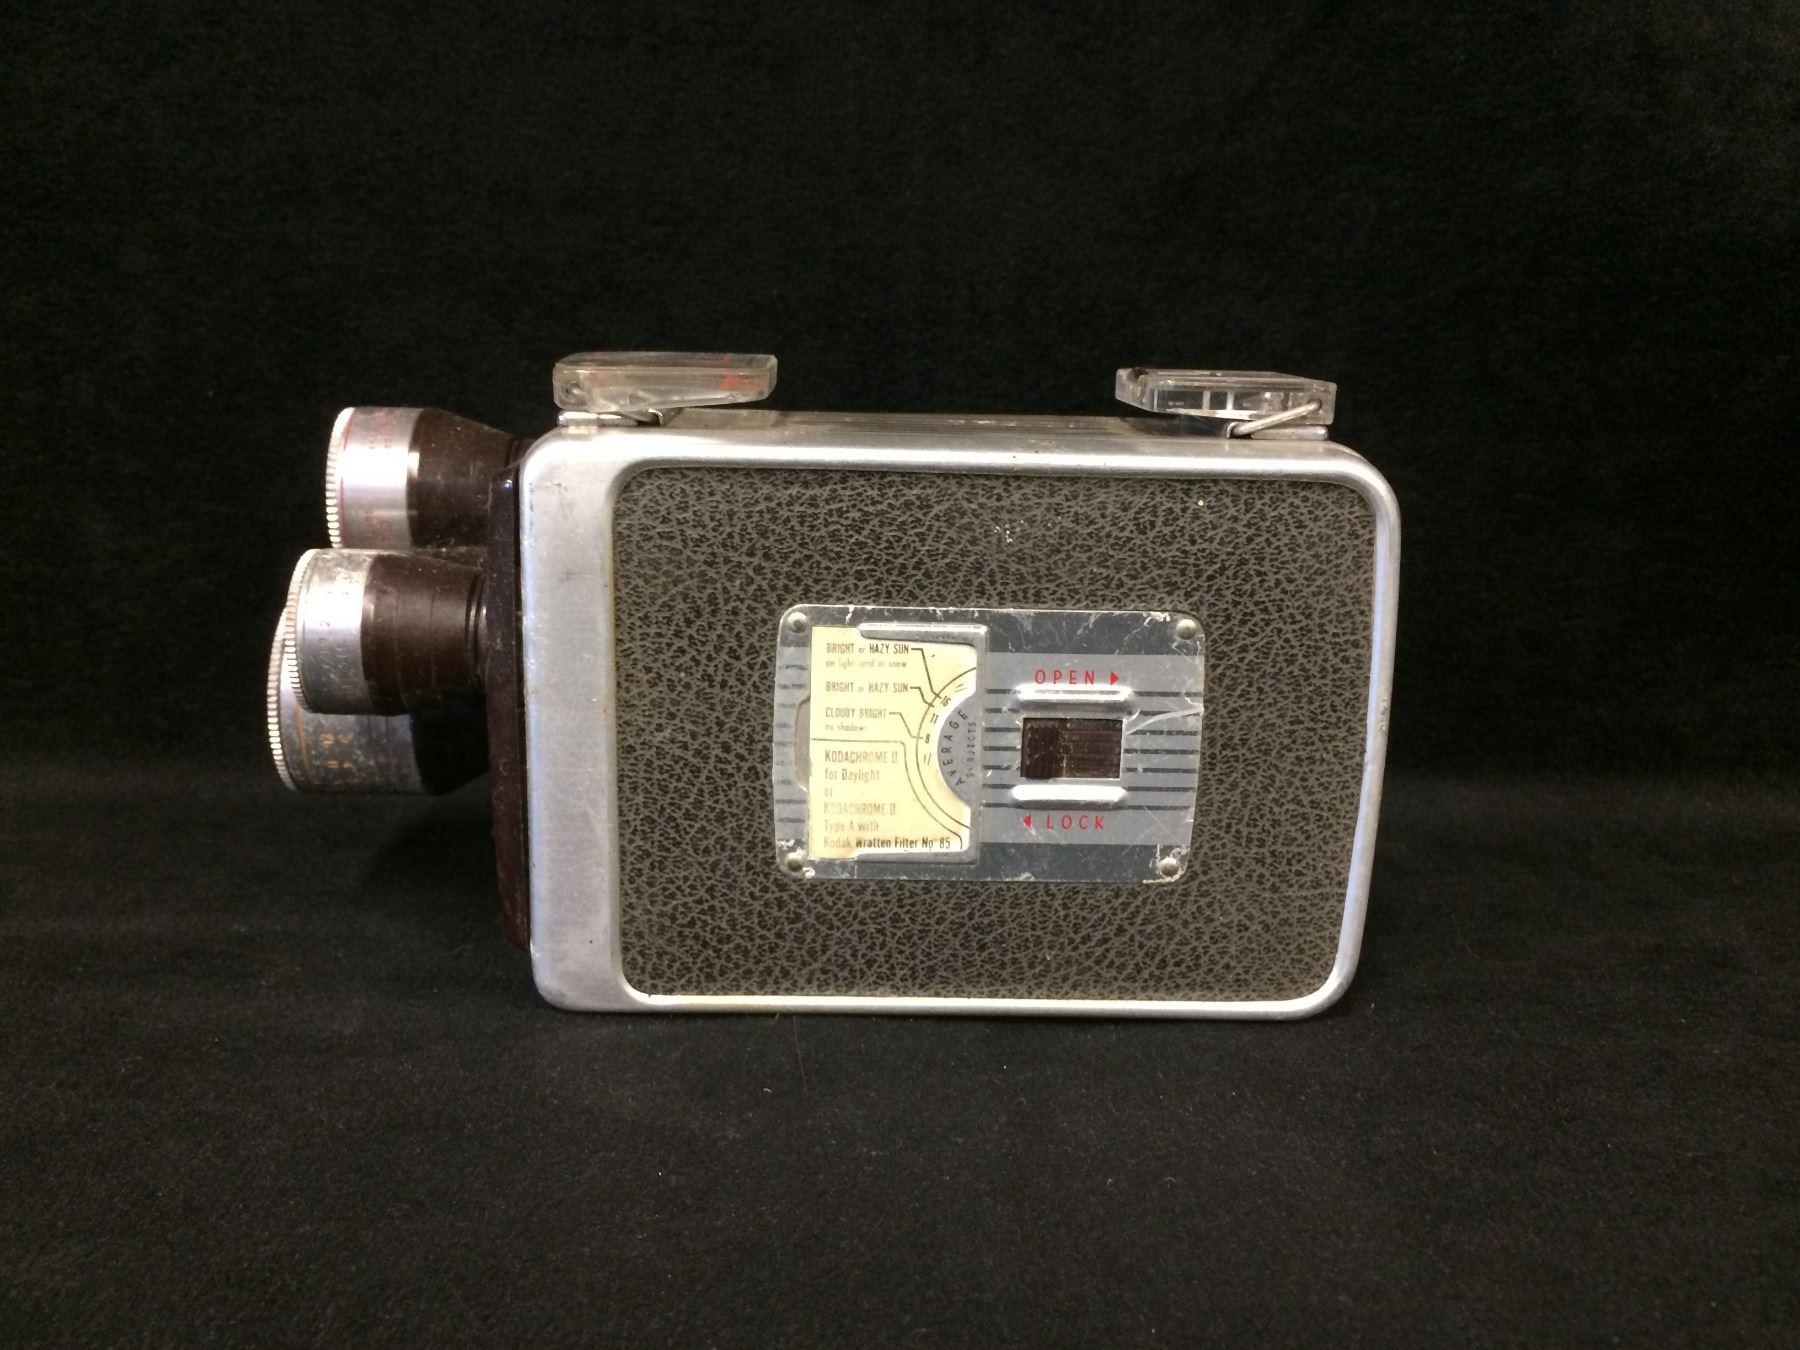 8Mm Vintage Camera vintage kodak brownie movie camera 8mm